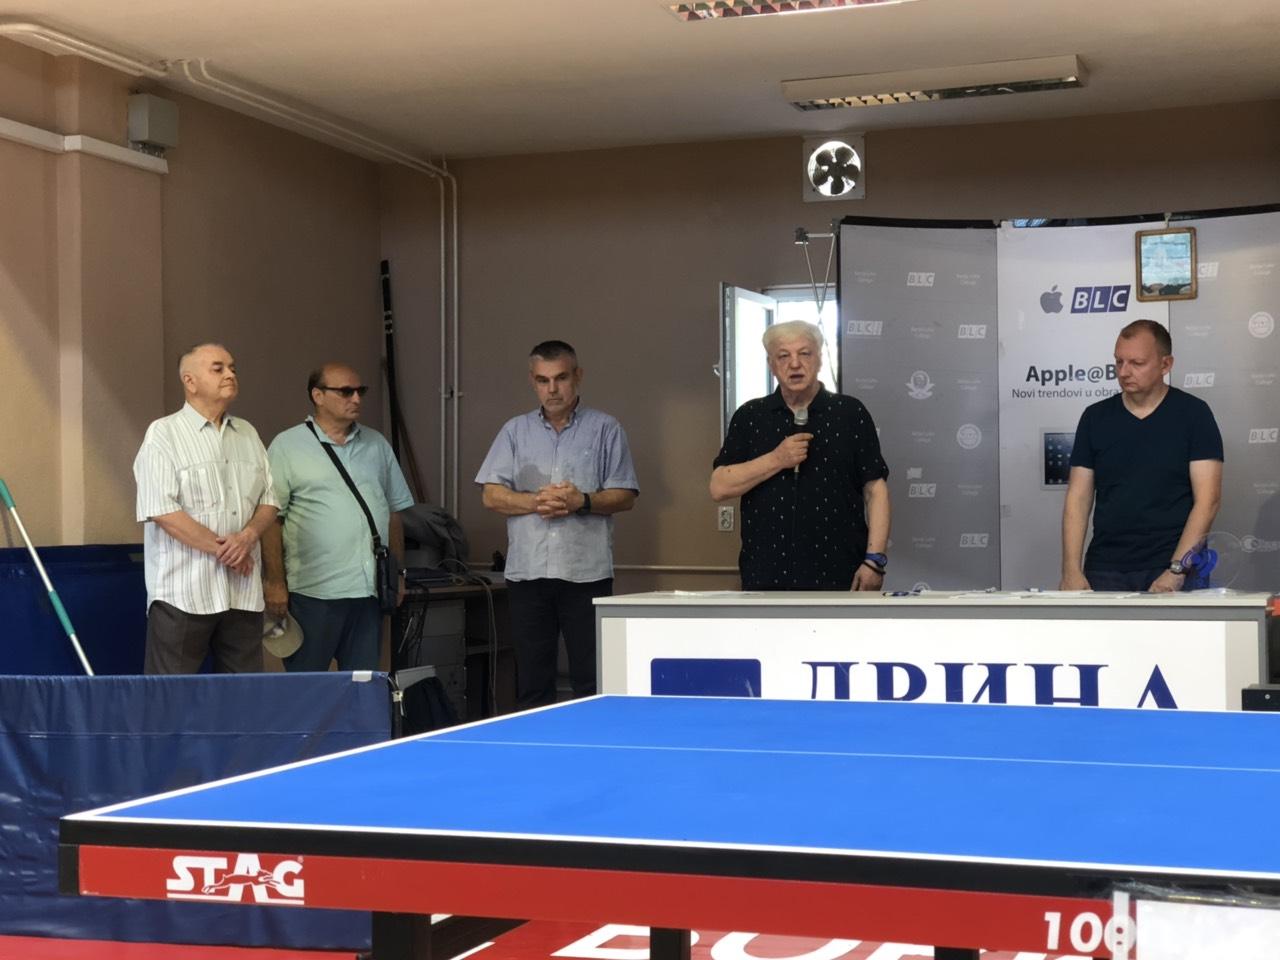 Poceo stonoteniski turnir